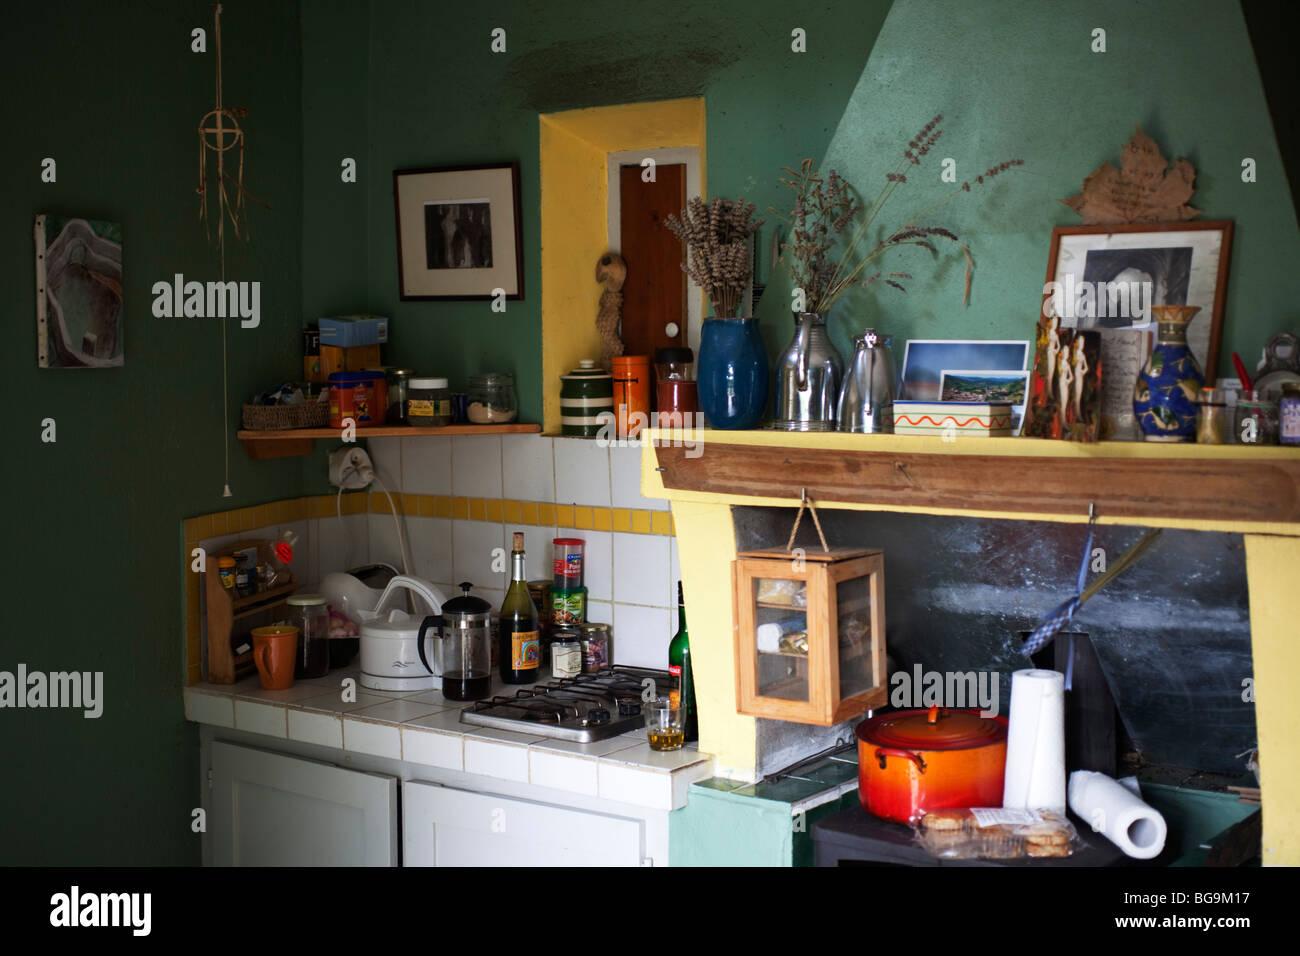 Lujoso Cocinas De Campo Francesa Molde - Ideas de Decoración de ...